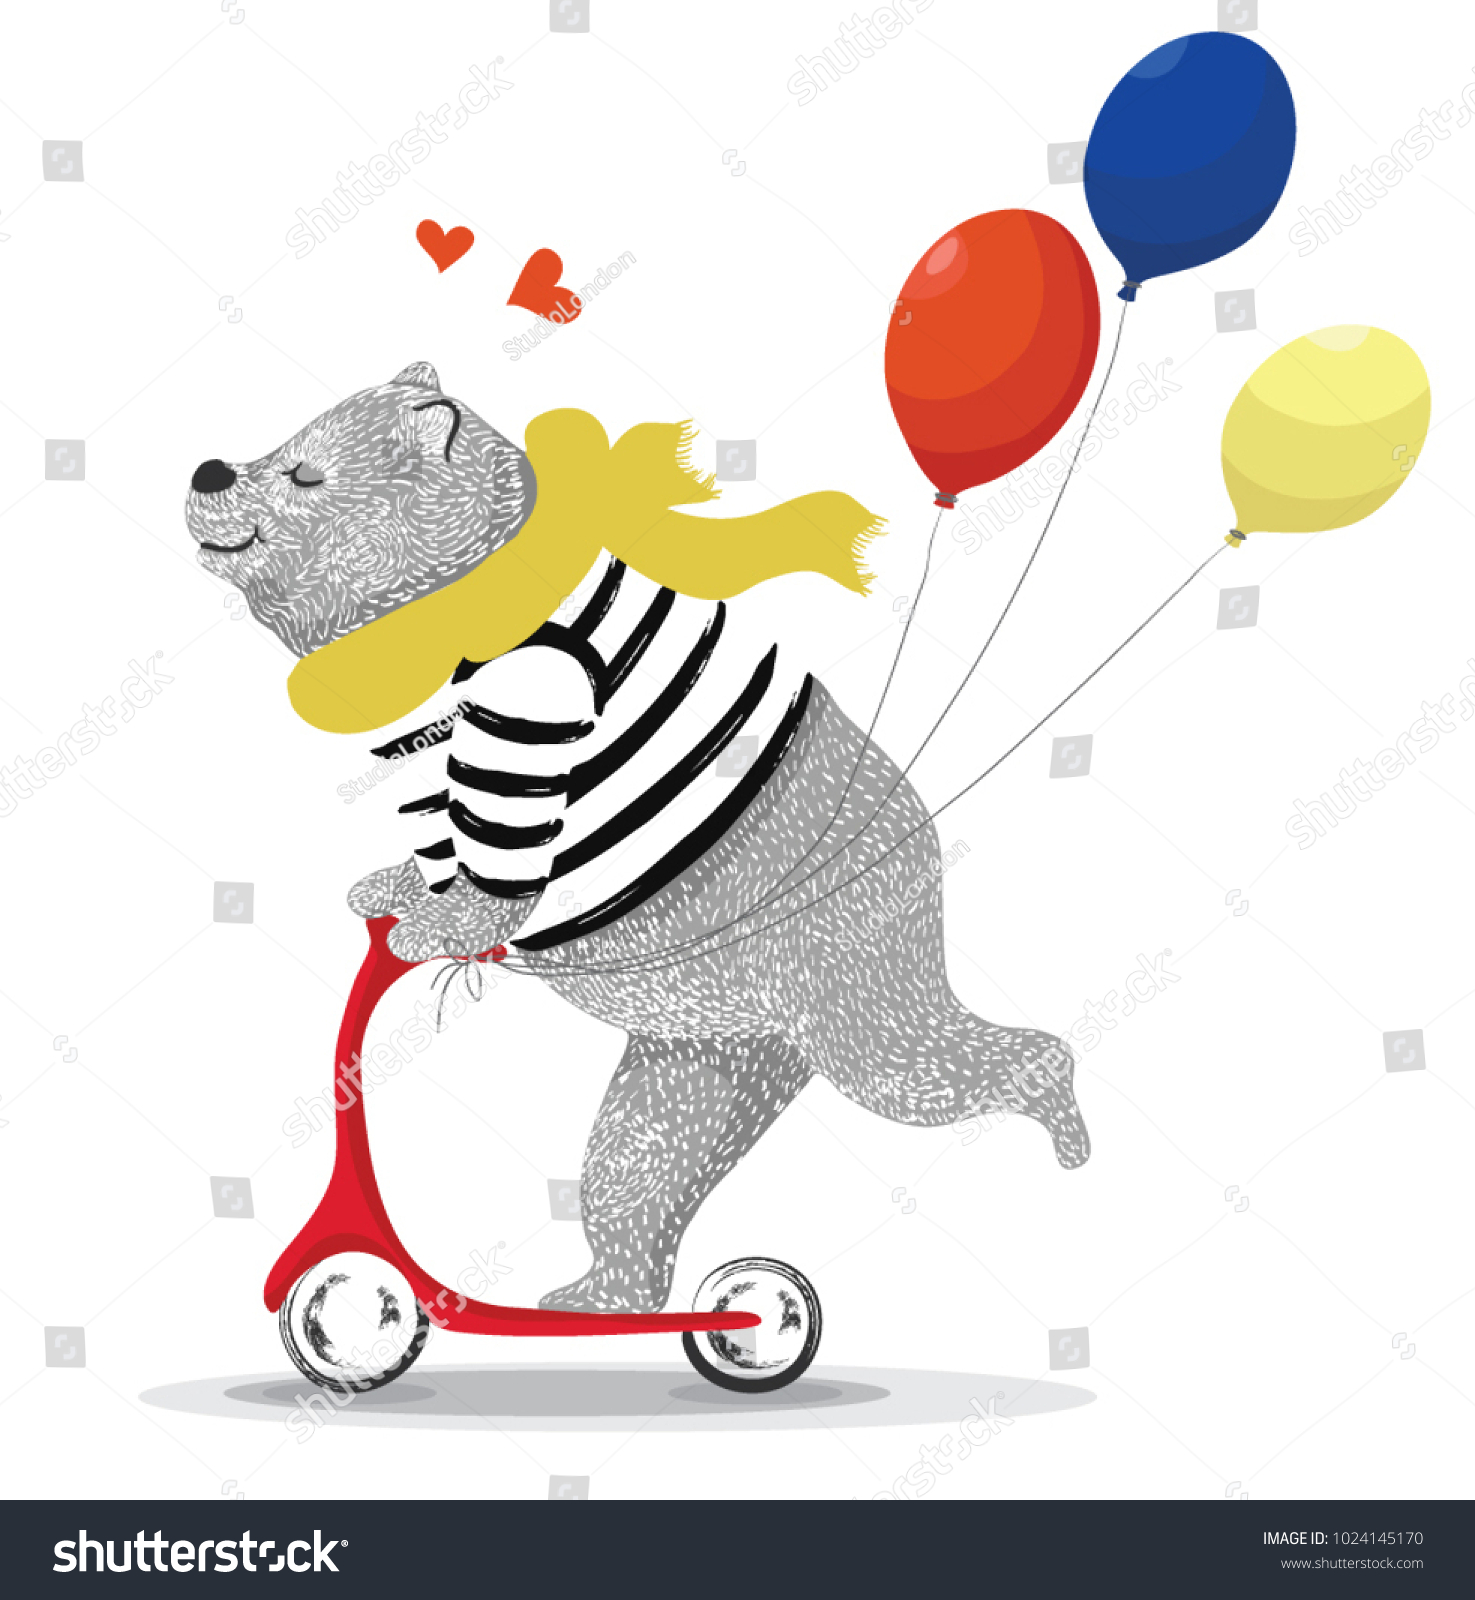 Immagine Vettoriale A Tema Cute Bear Illustration Tshirt Graphics